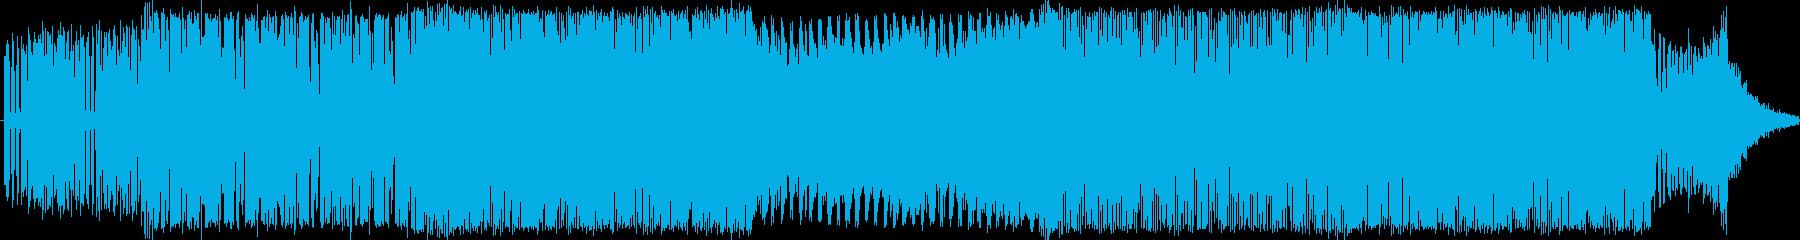 EDMクラブ系ダンスミュージック_2の再生済みの波形